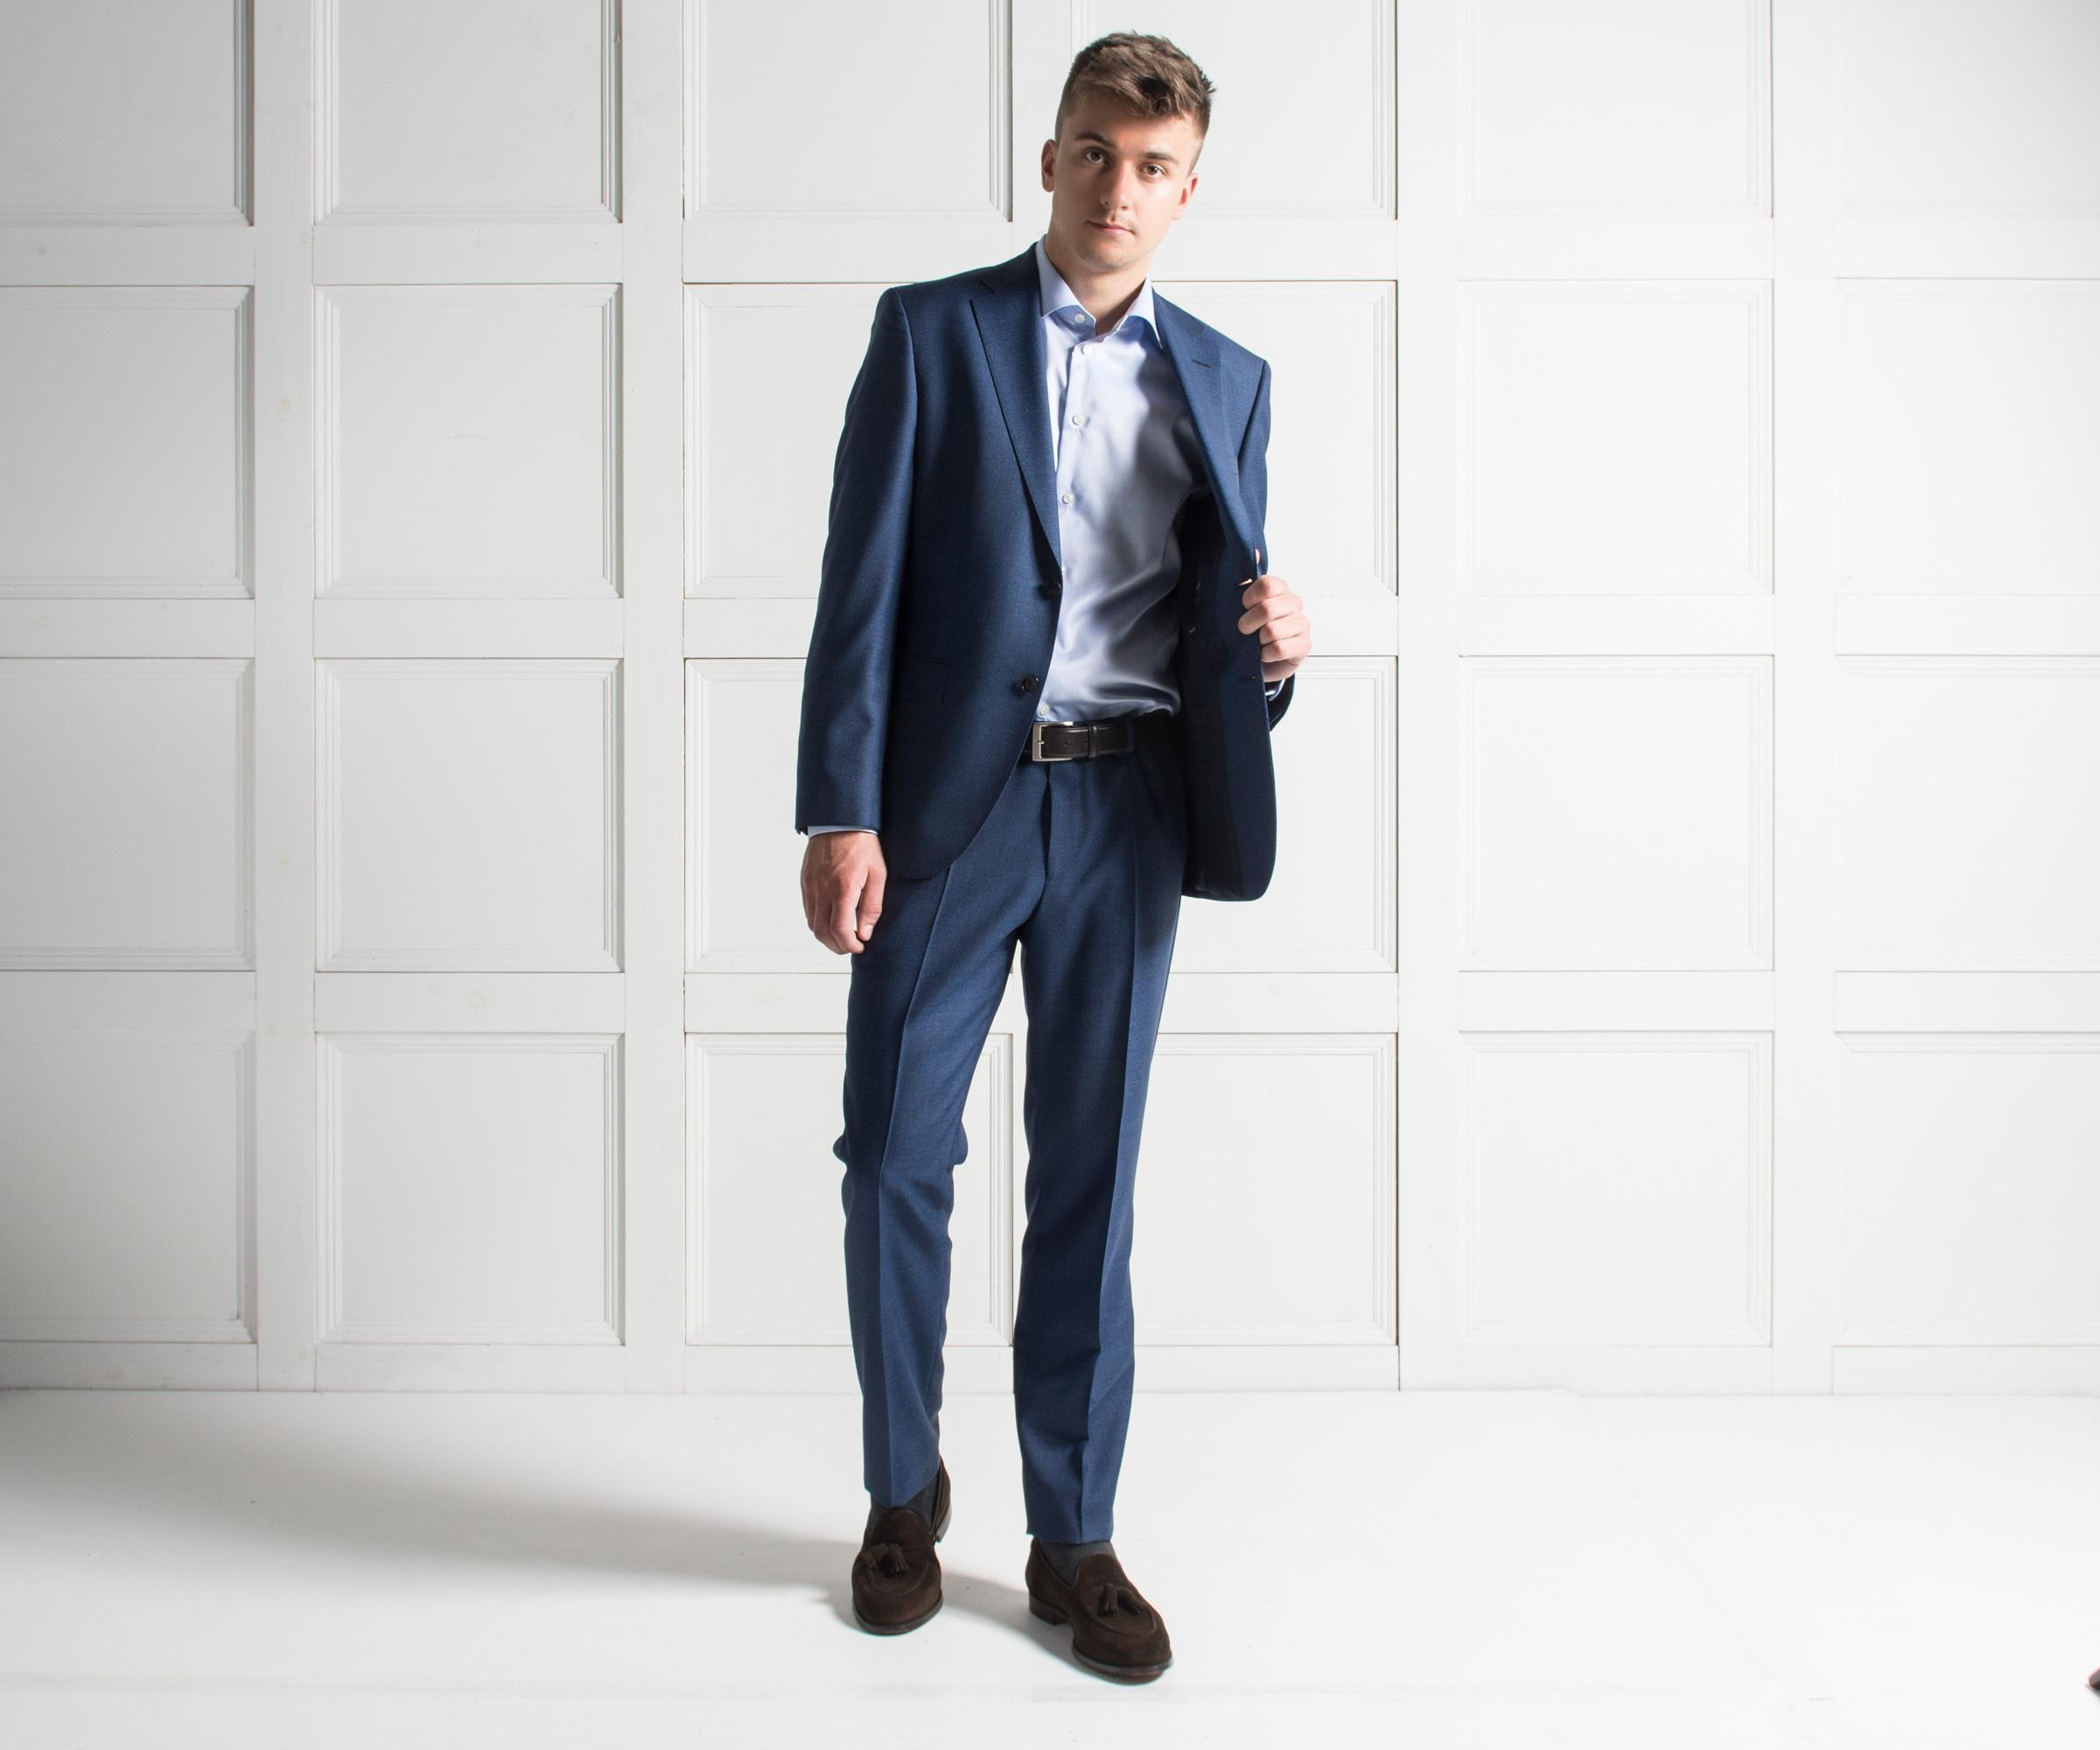 bf2a12a6a BOSS 'johnstons5/lenon1' Melange Virgin Wool Suit Dark Blue in Blue ...